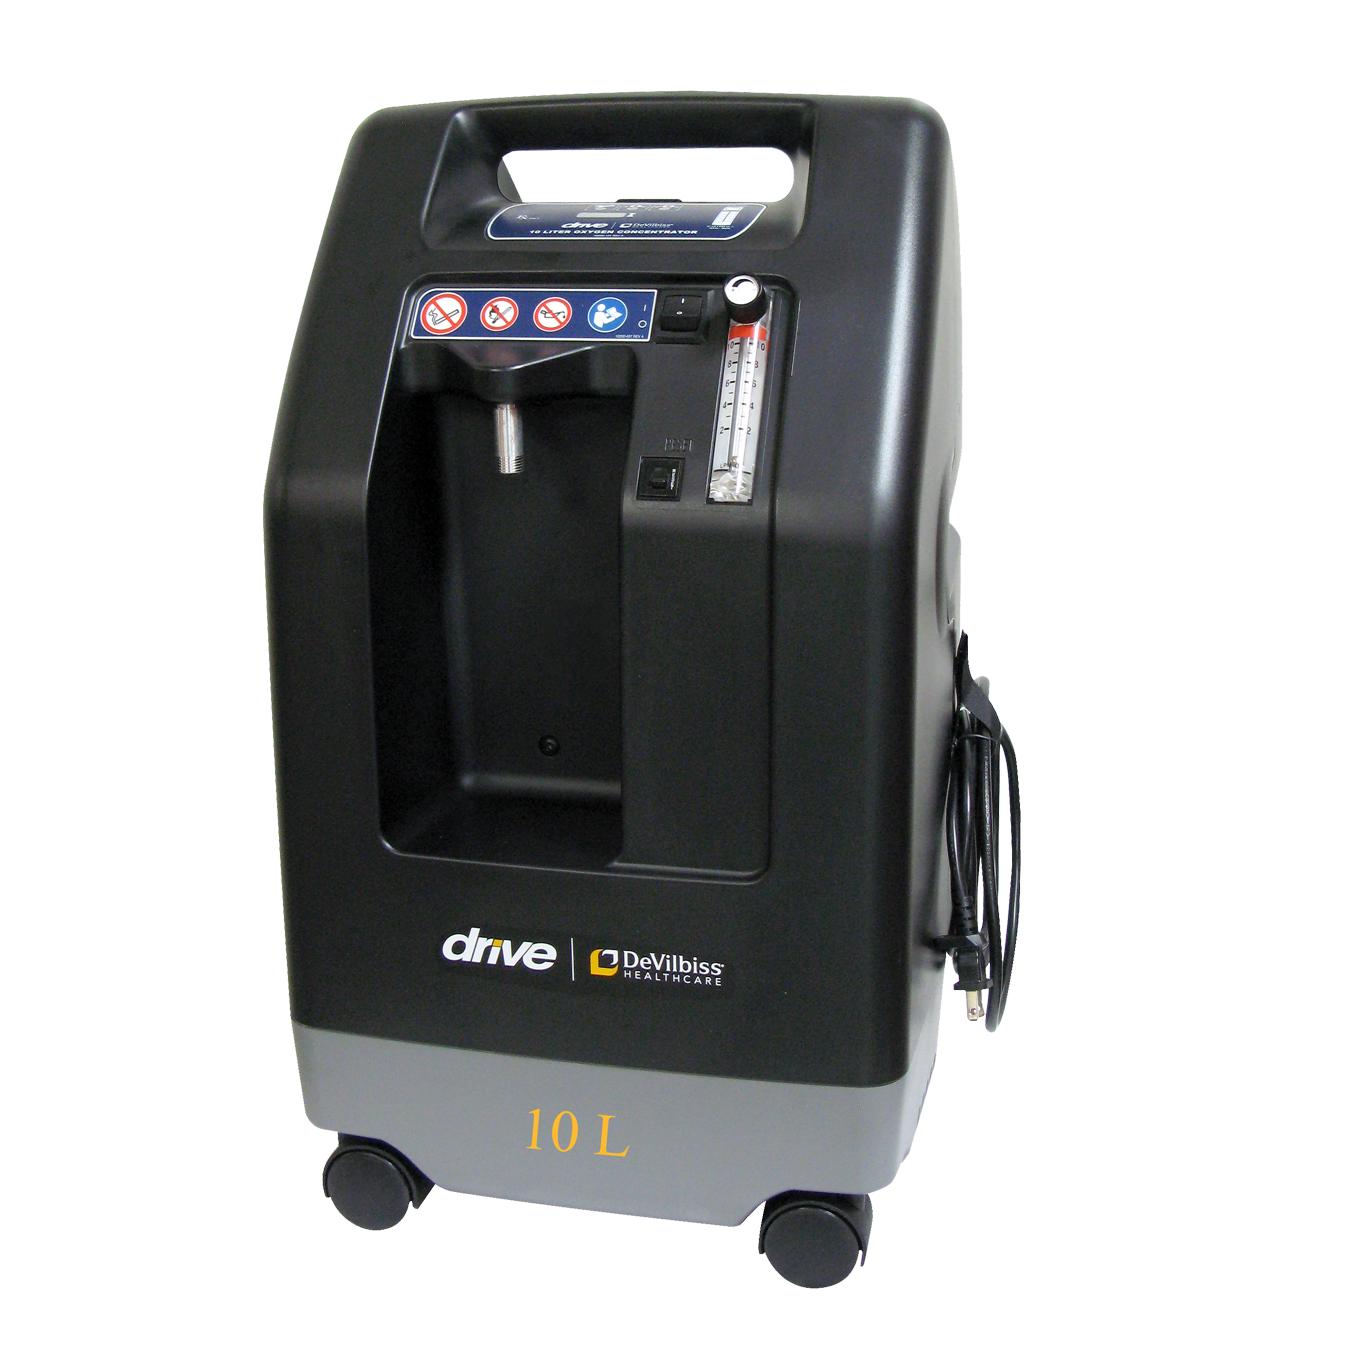 Devilbiss Compact1025 10 liter oxygen concentrator